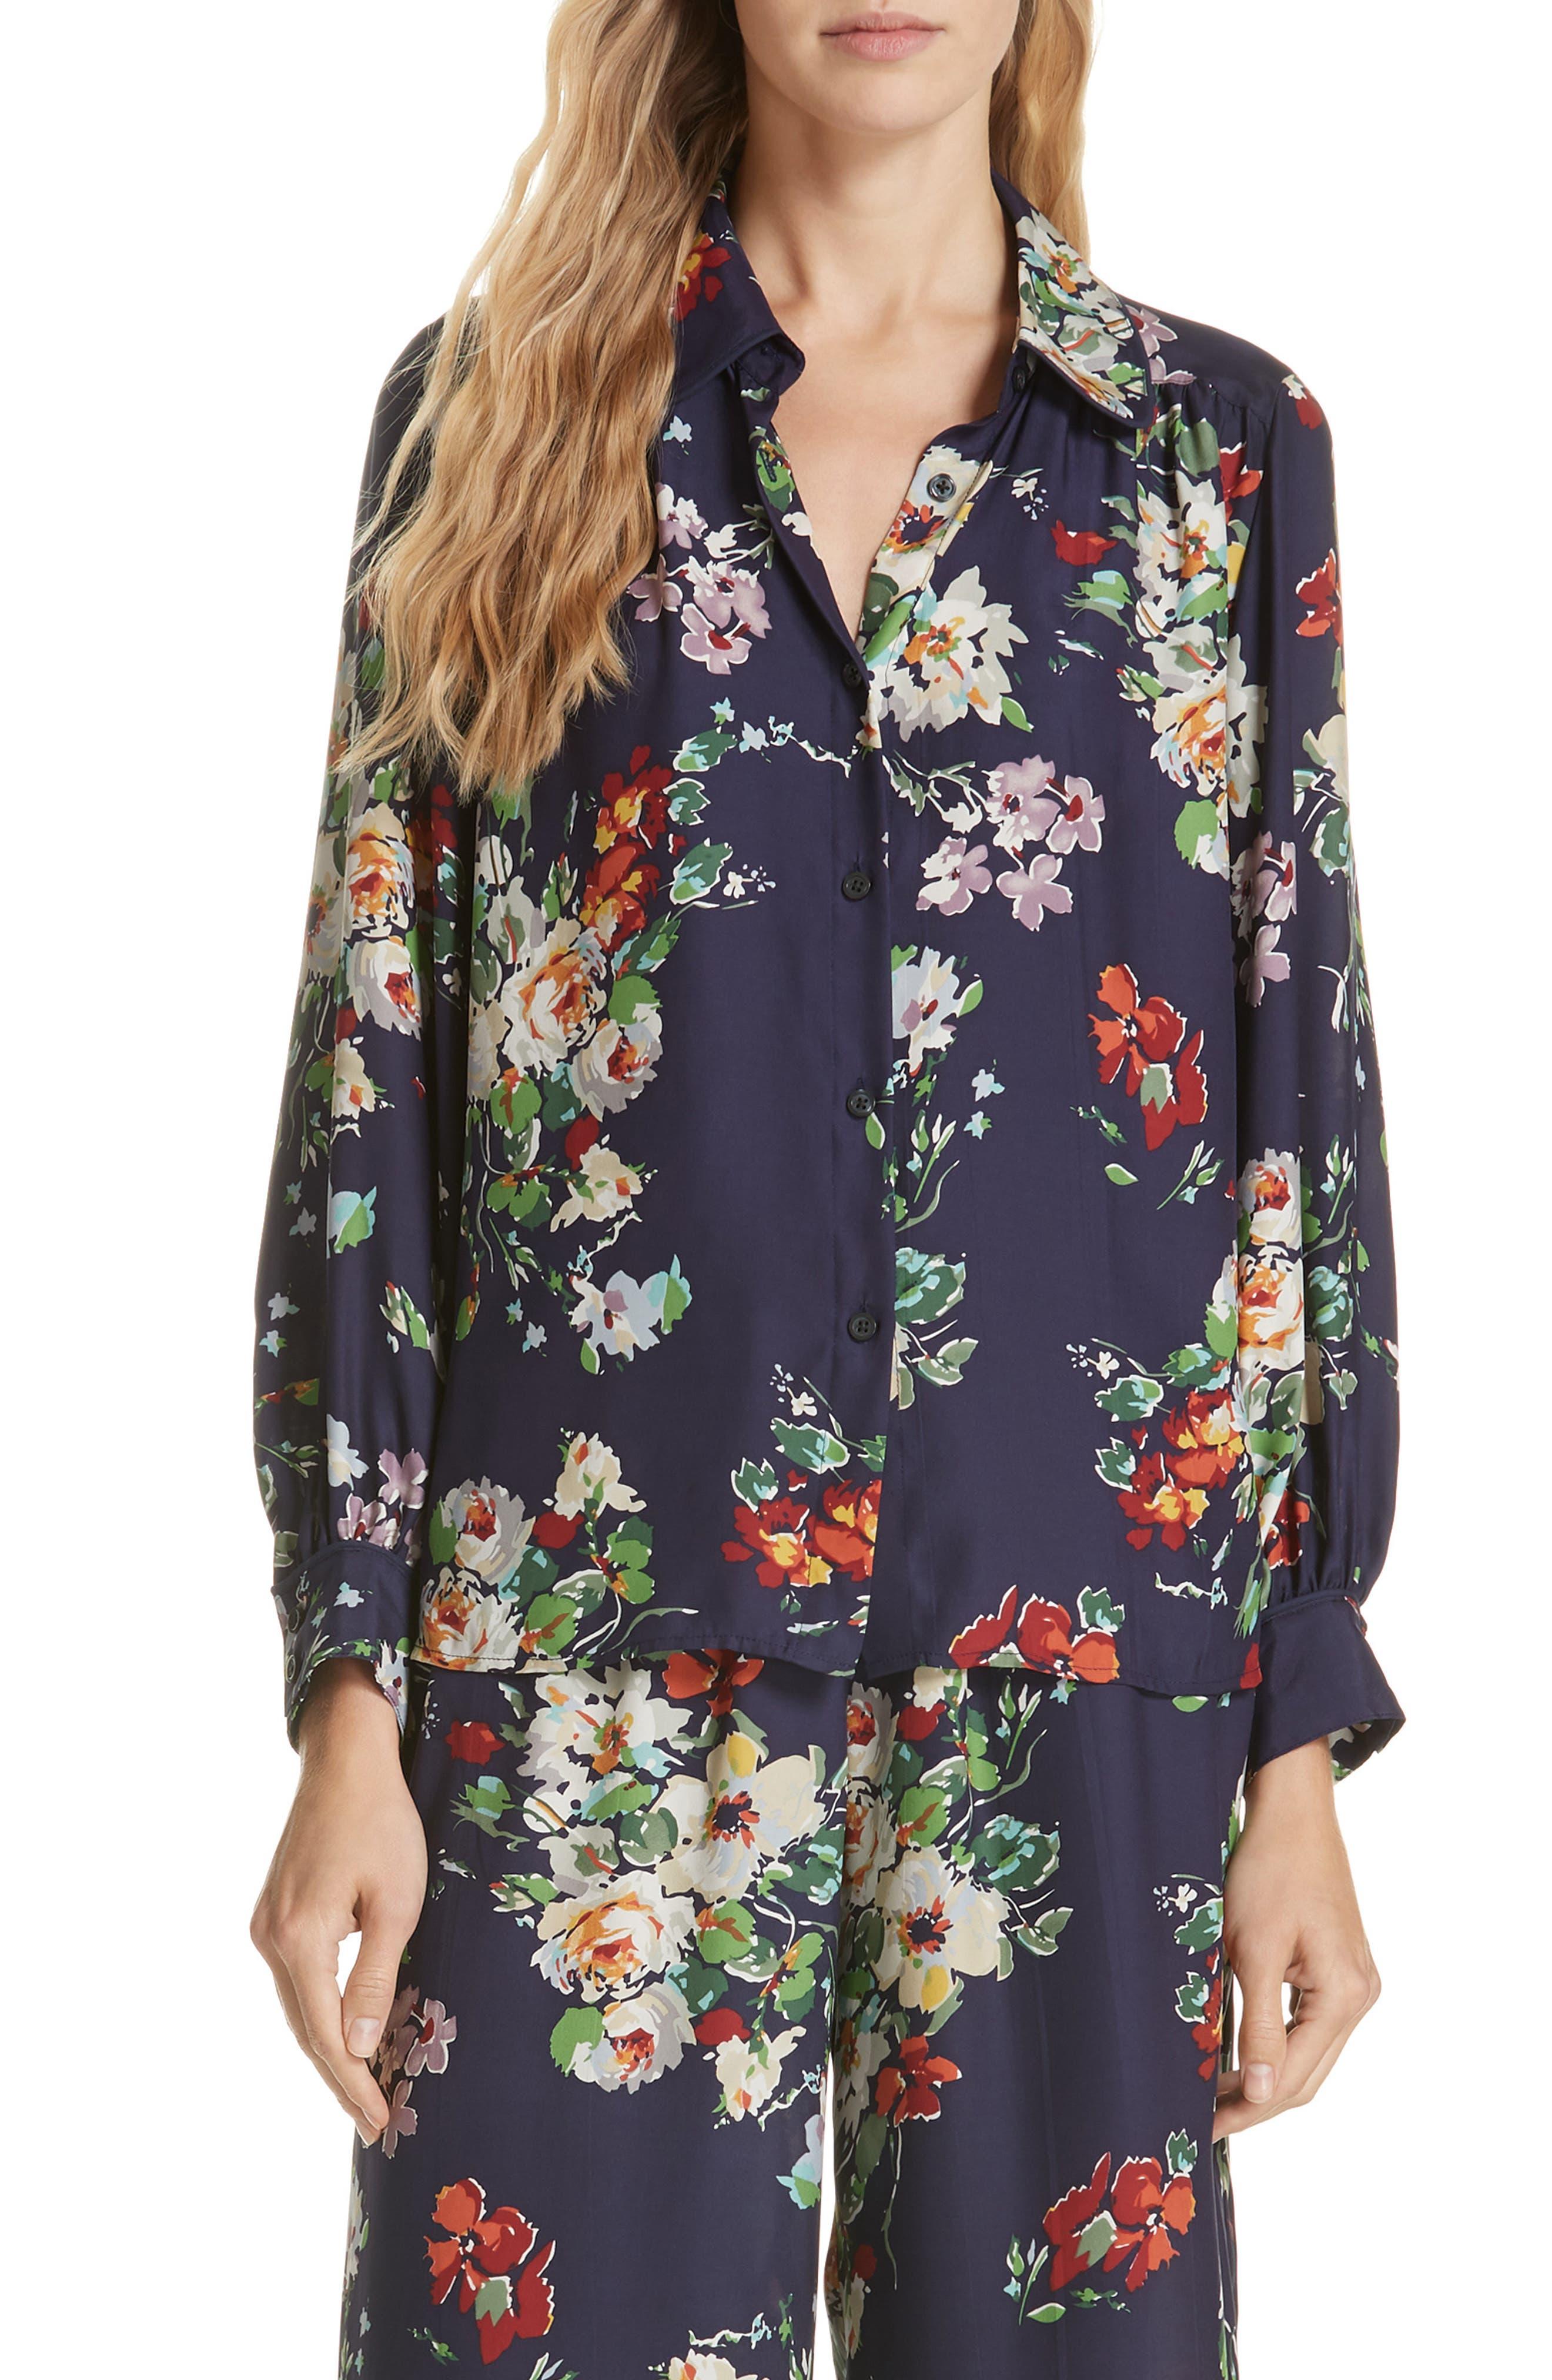 Floral Silk Blouse,                             Main thumbnail 1, color,                             NIGHTFALL FLORAL PRINT